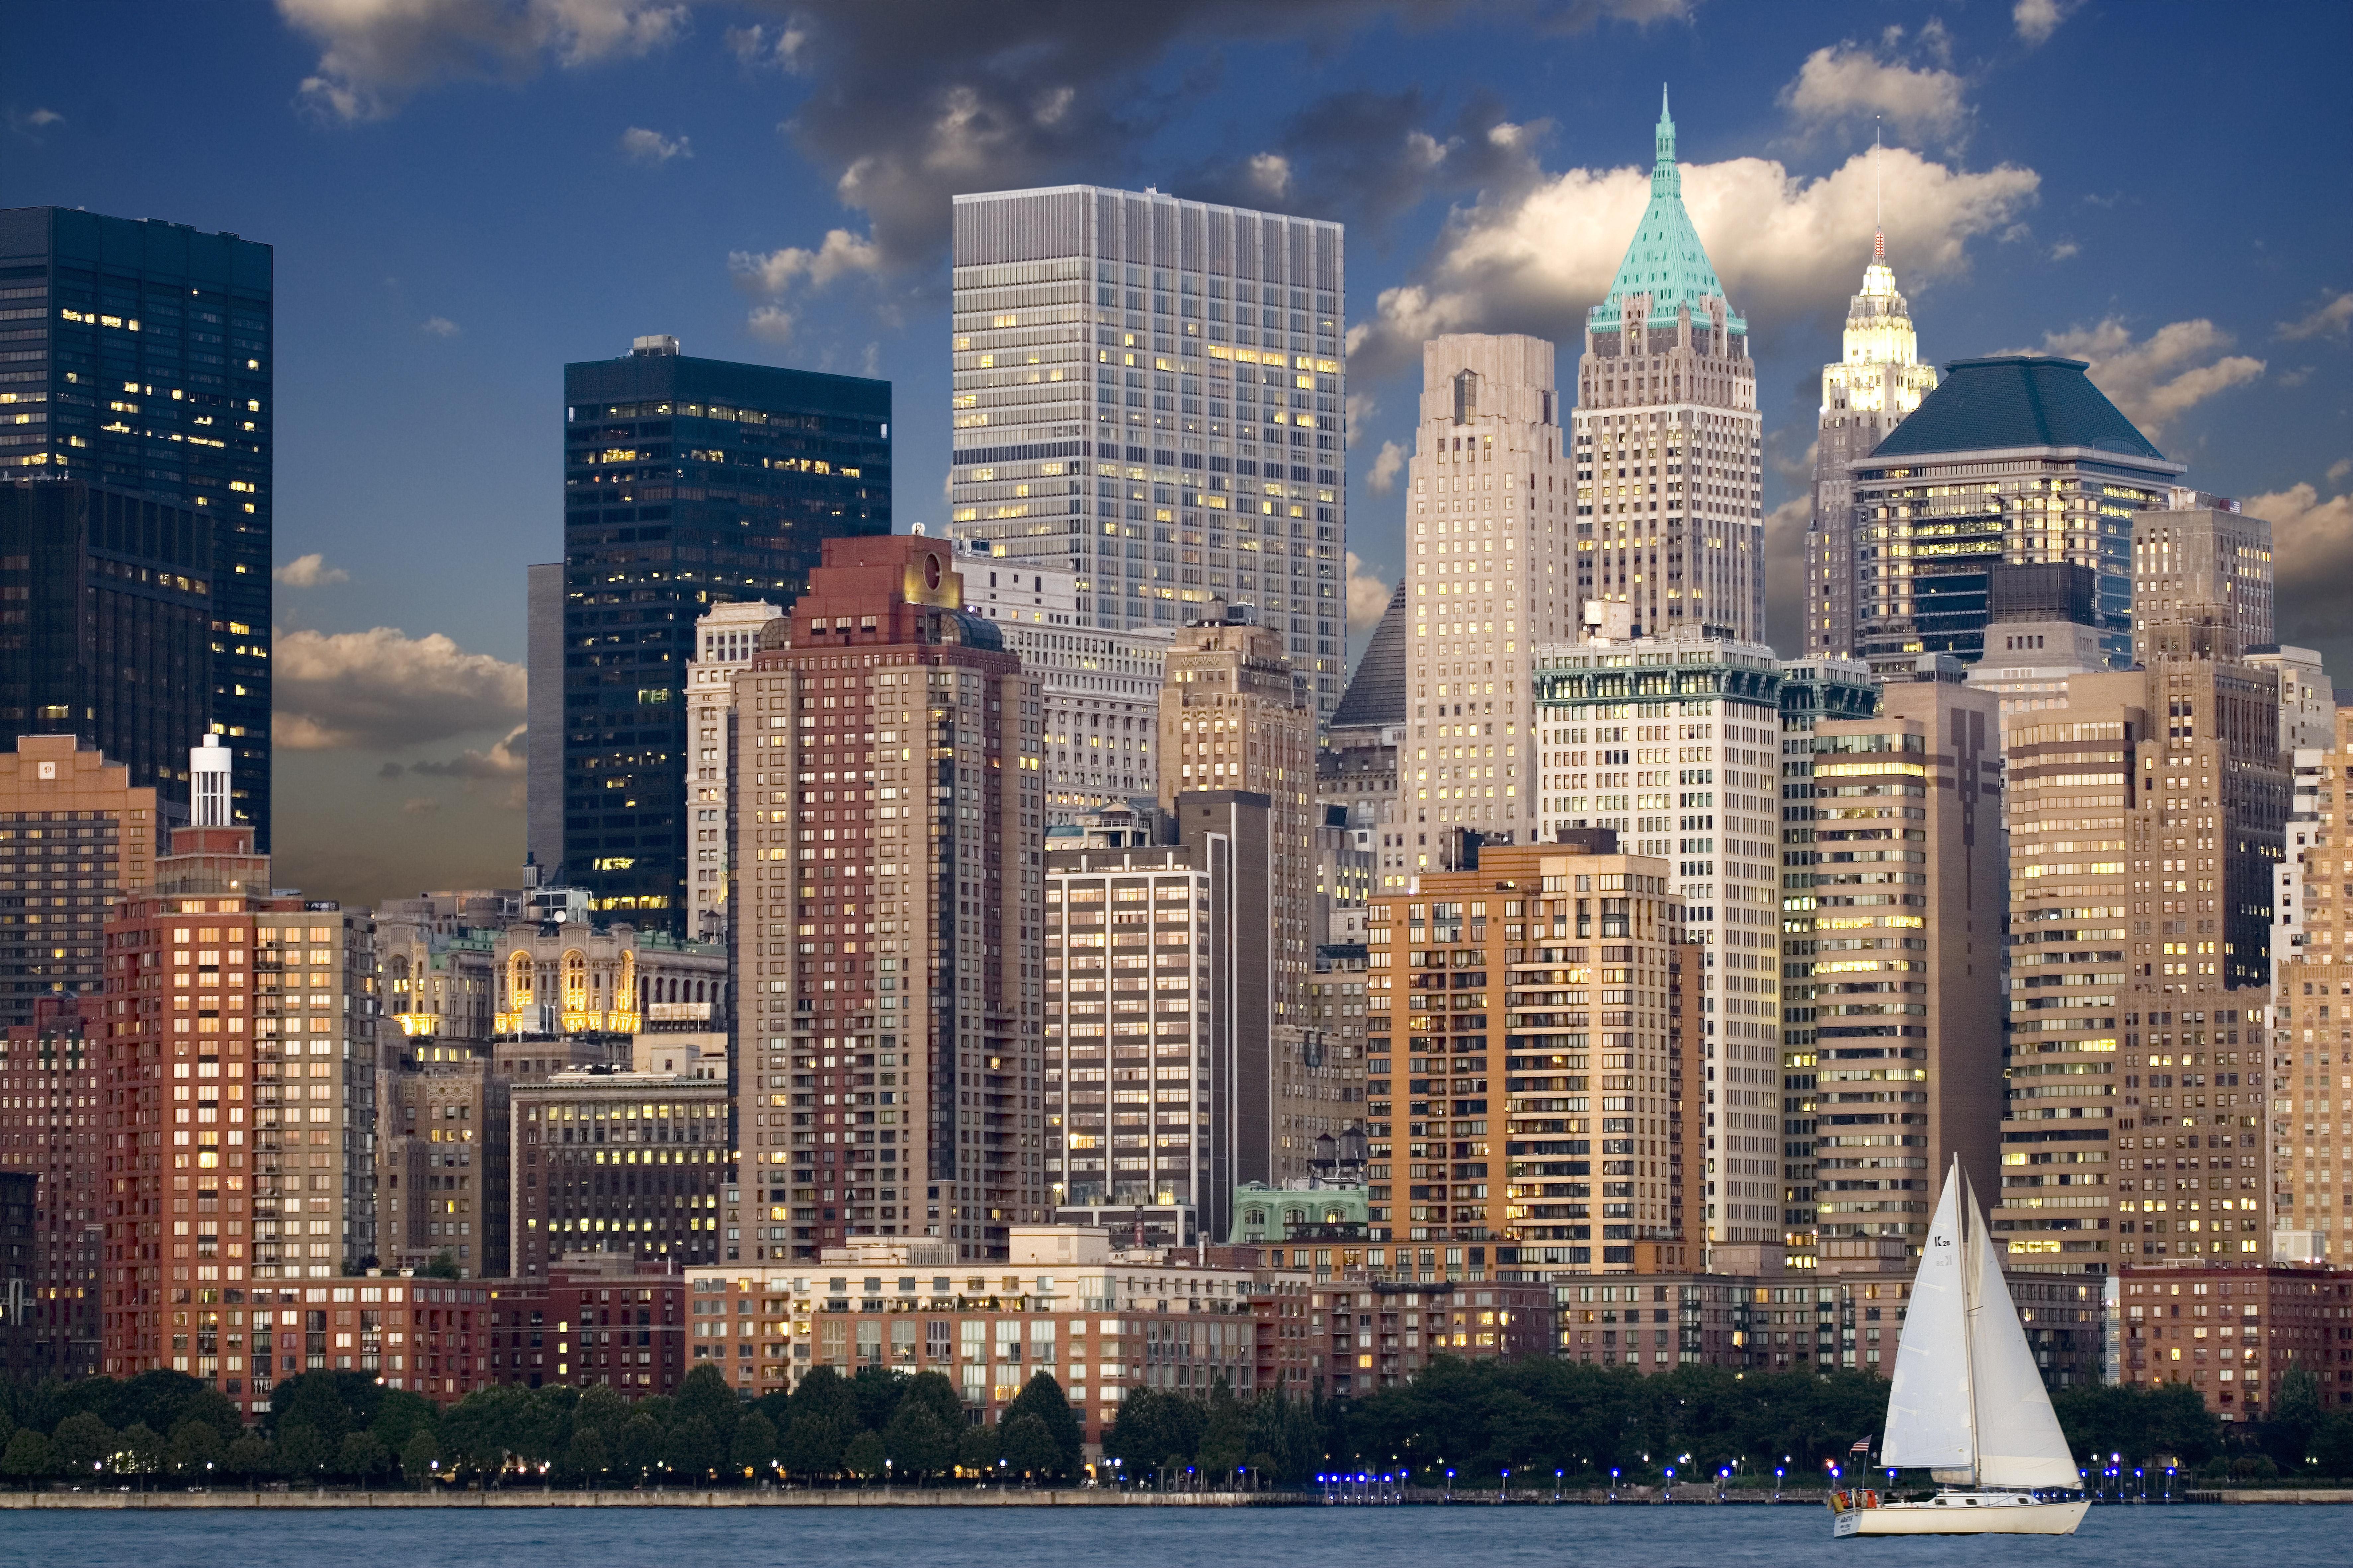 New York City Wallpaper Pexels Kostenlose Stock Fotos